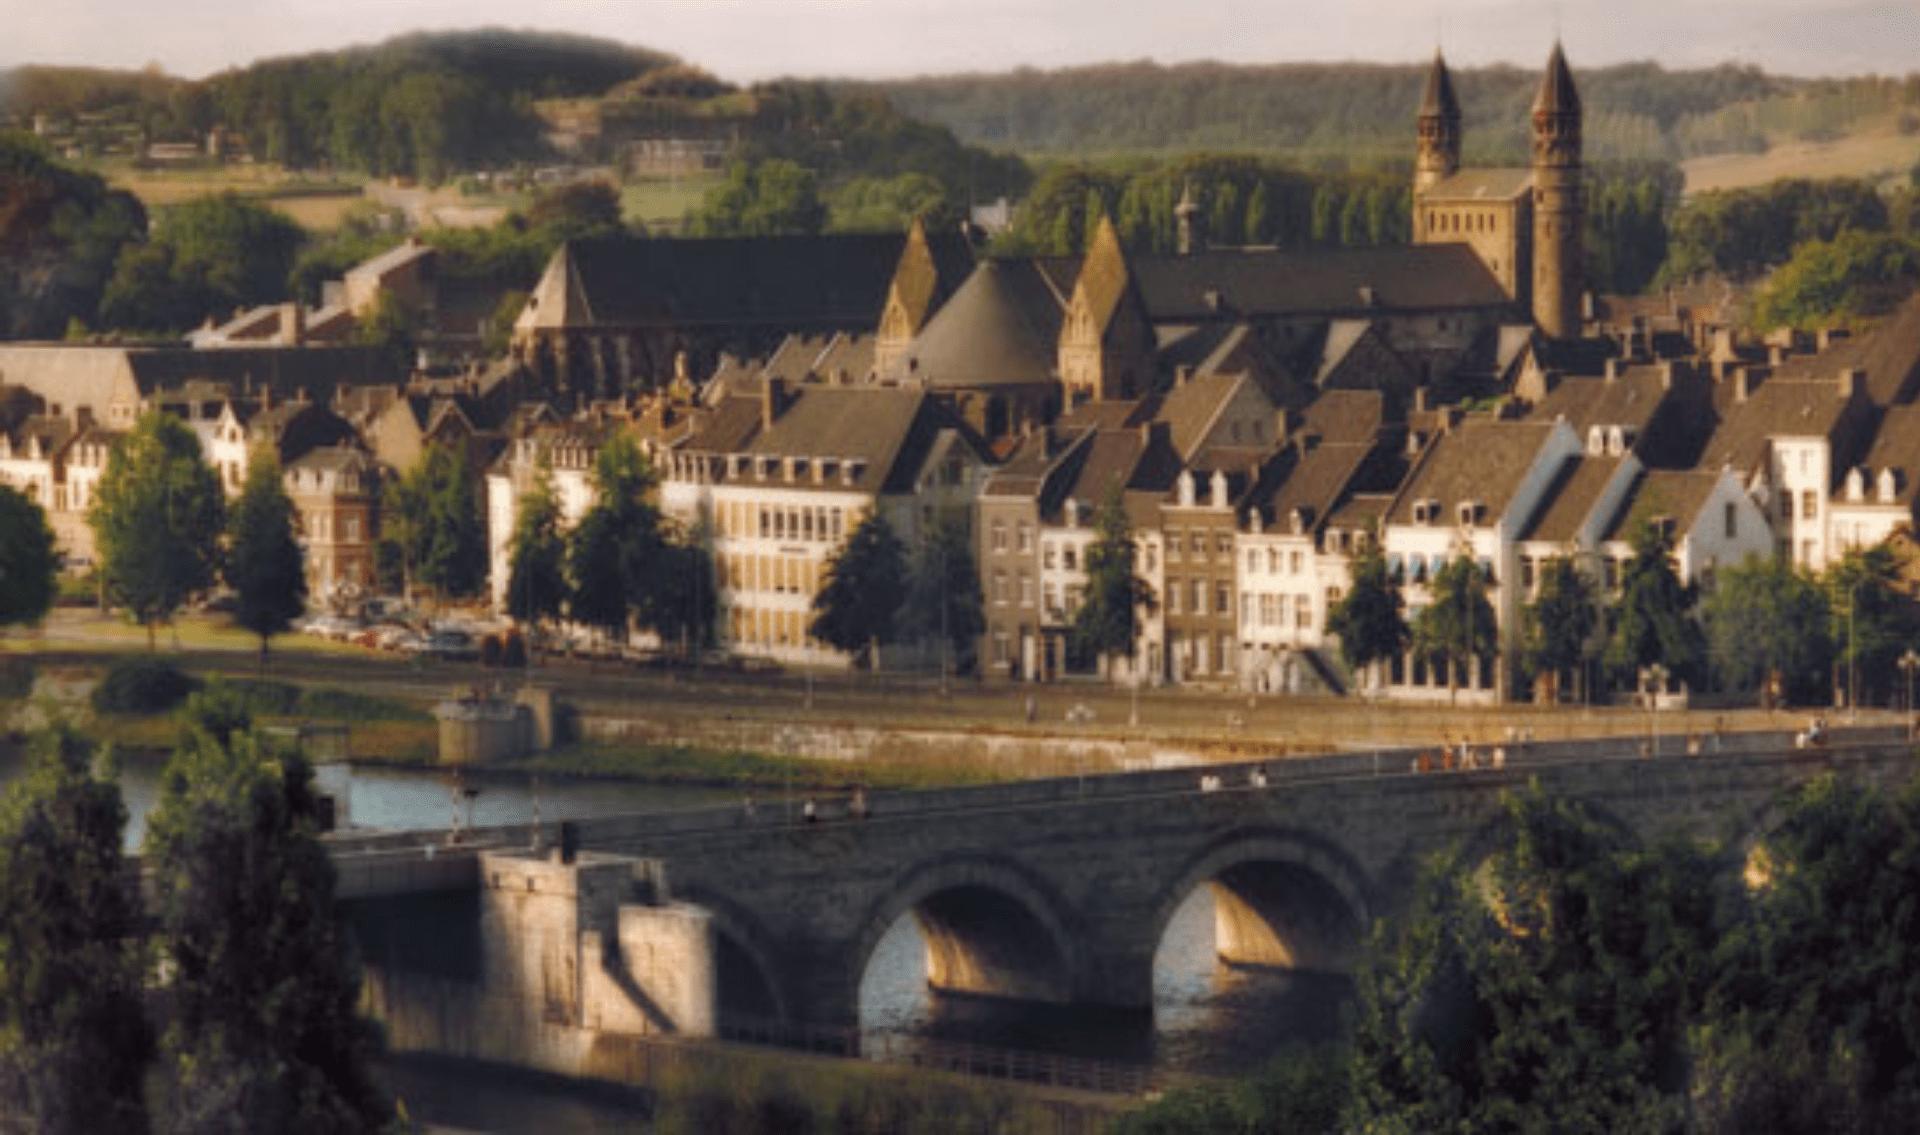 Fietsvakantie Internationale Maasroute van Maastricht naar Sedan